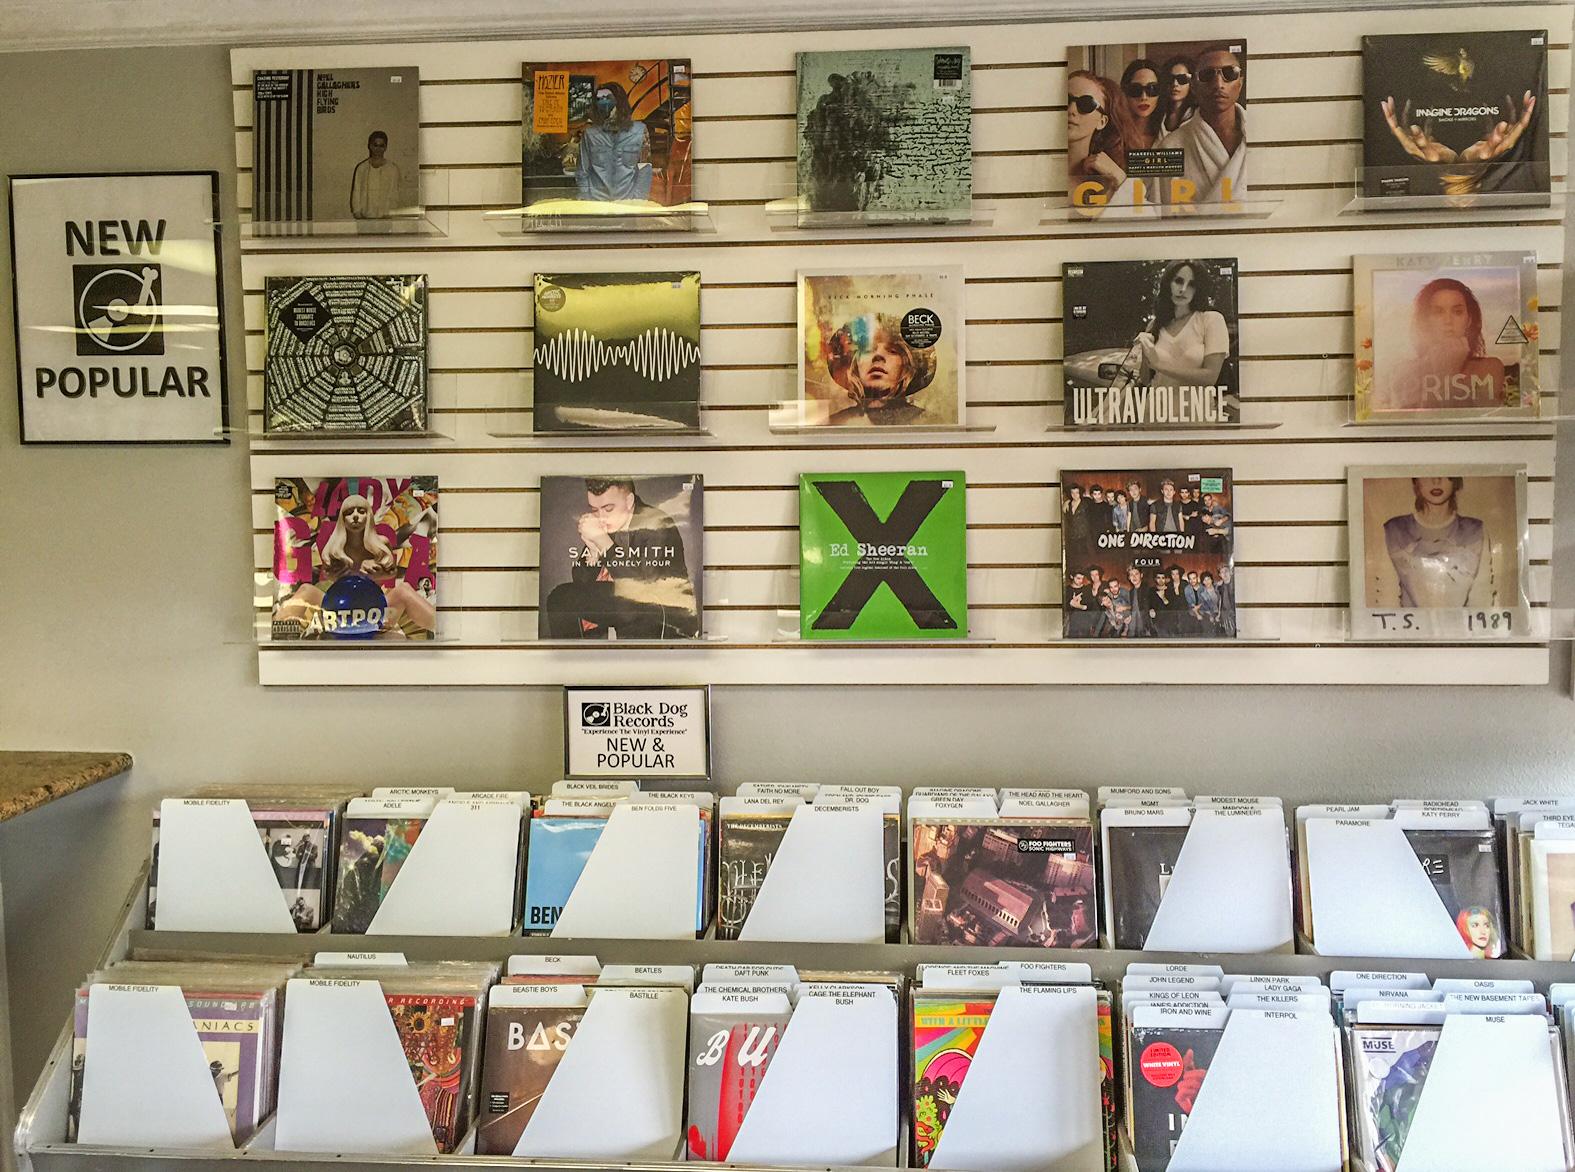 Black Dog Records Bellaire Tx